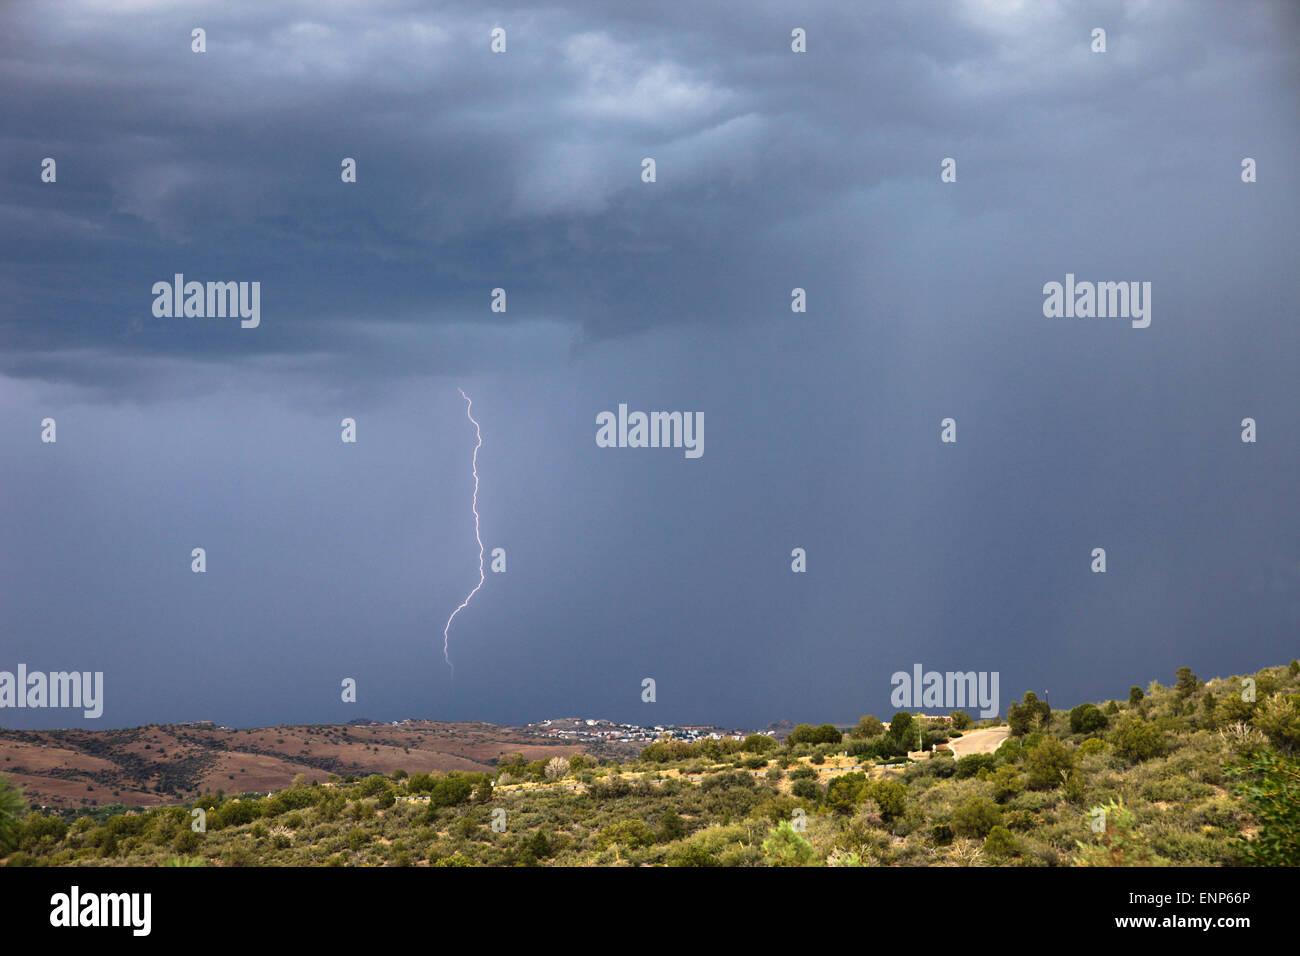 Lightning strike over Arizona - Stock Image